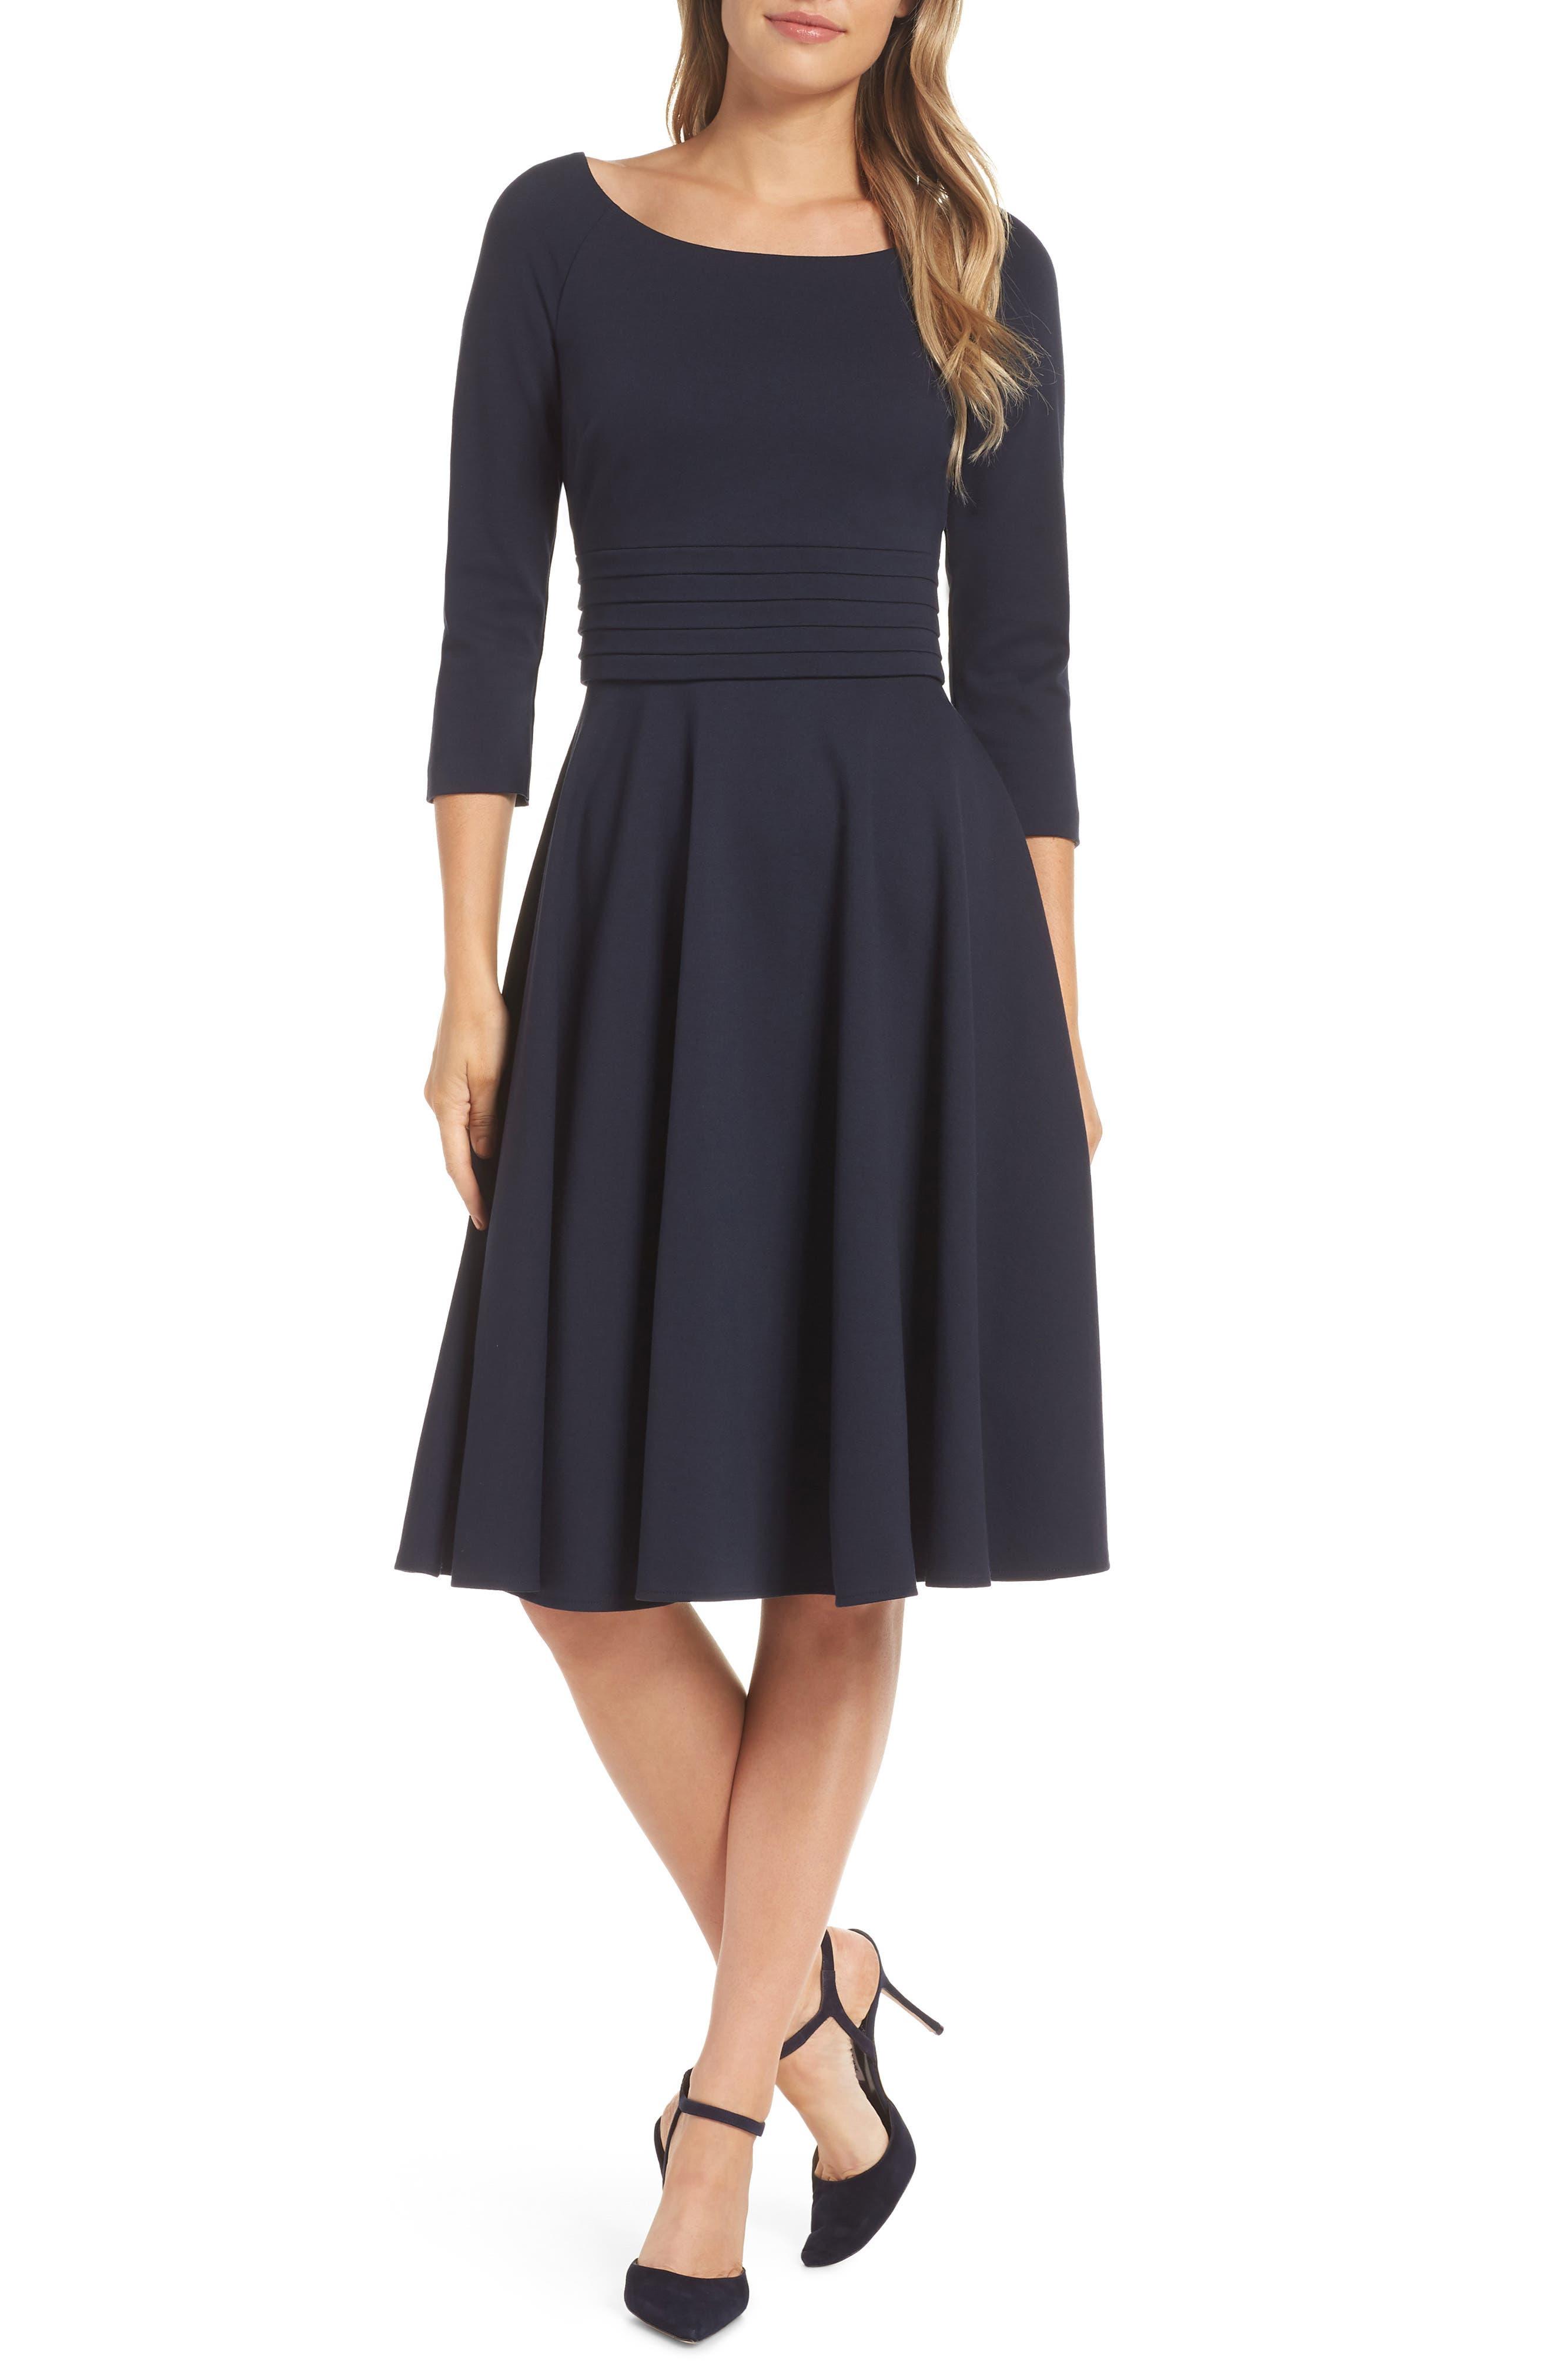 HARPER ROSE, Pleated Waist Fit & Flare Dress, Alternate thumbnail 6, color, 410